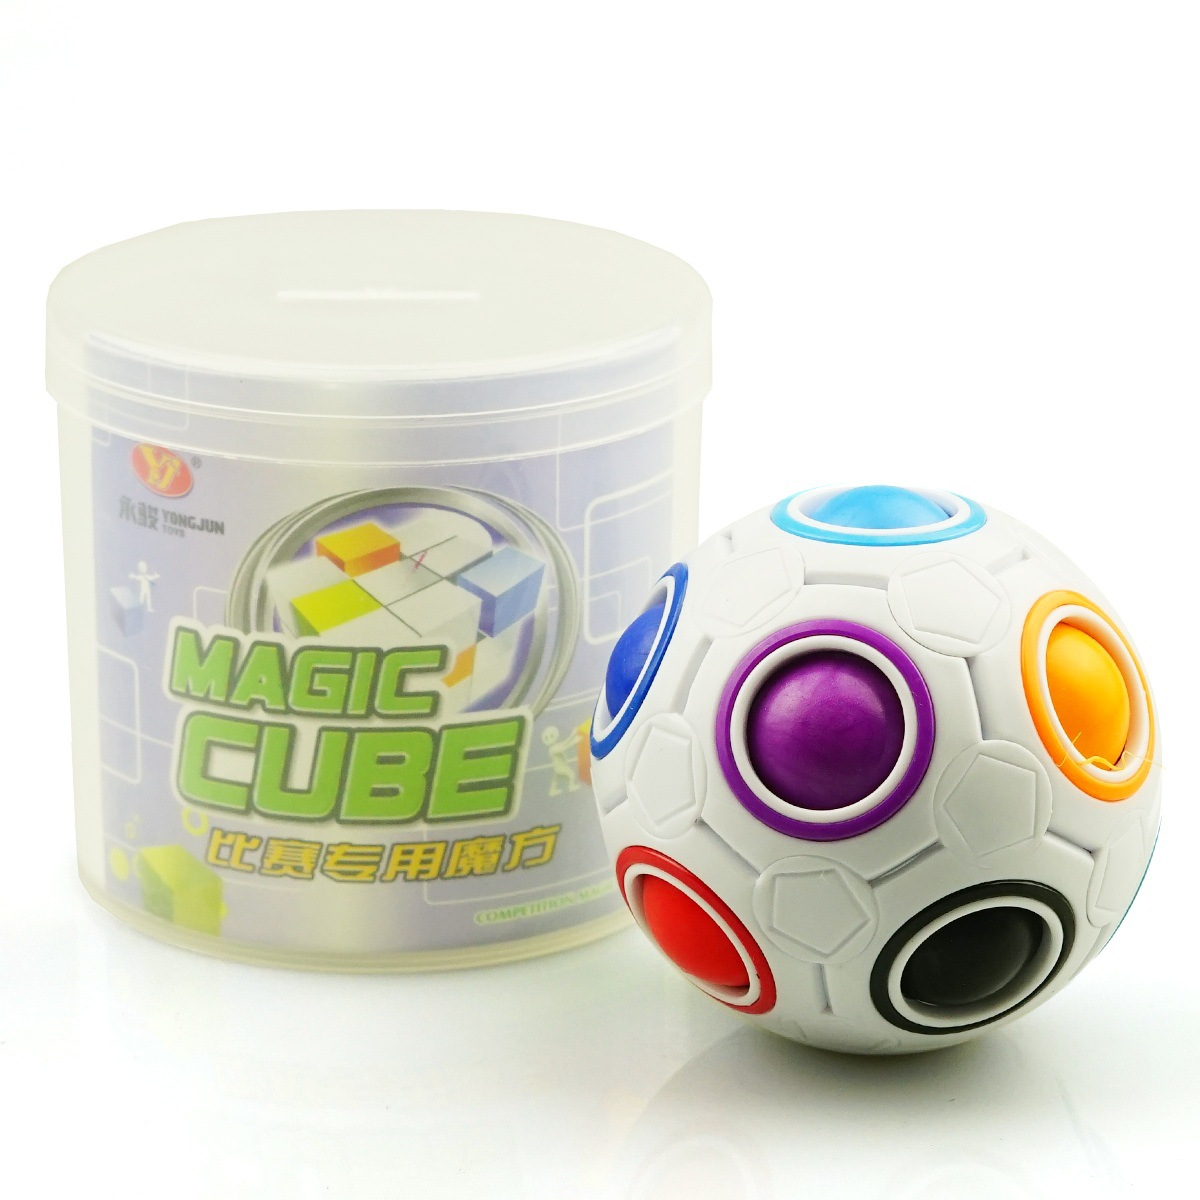 Magic Rainbow Ball Magic Football Puzzle Ball Cube Spherical Creative Educational Toys For Children Gift